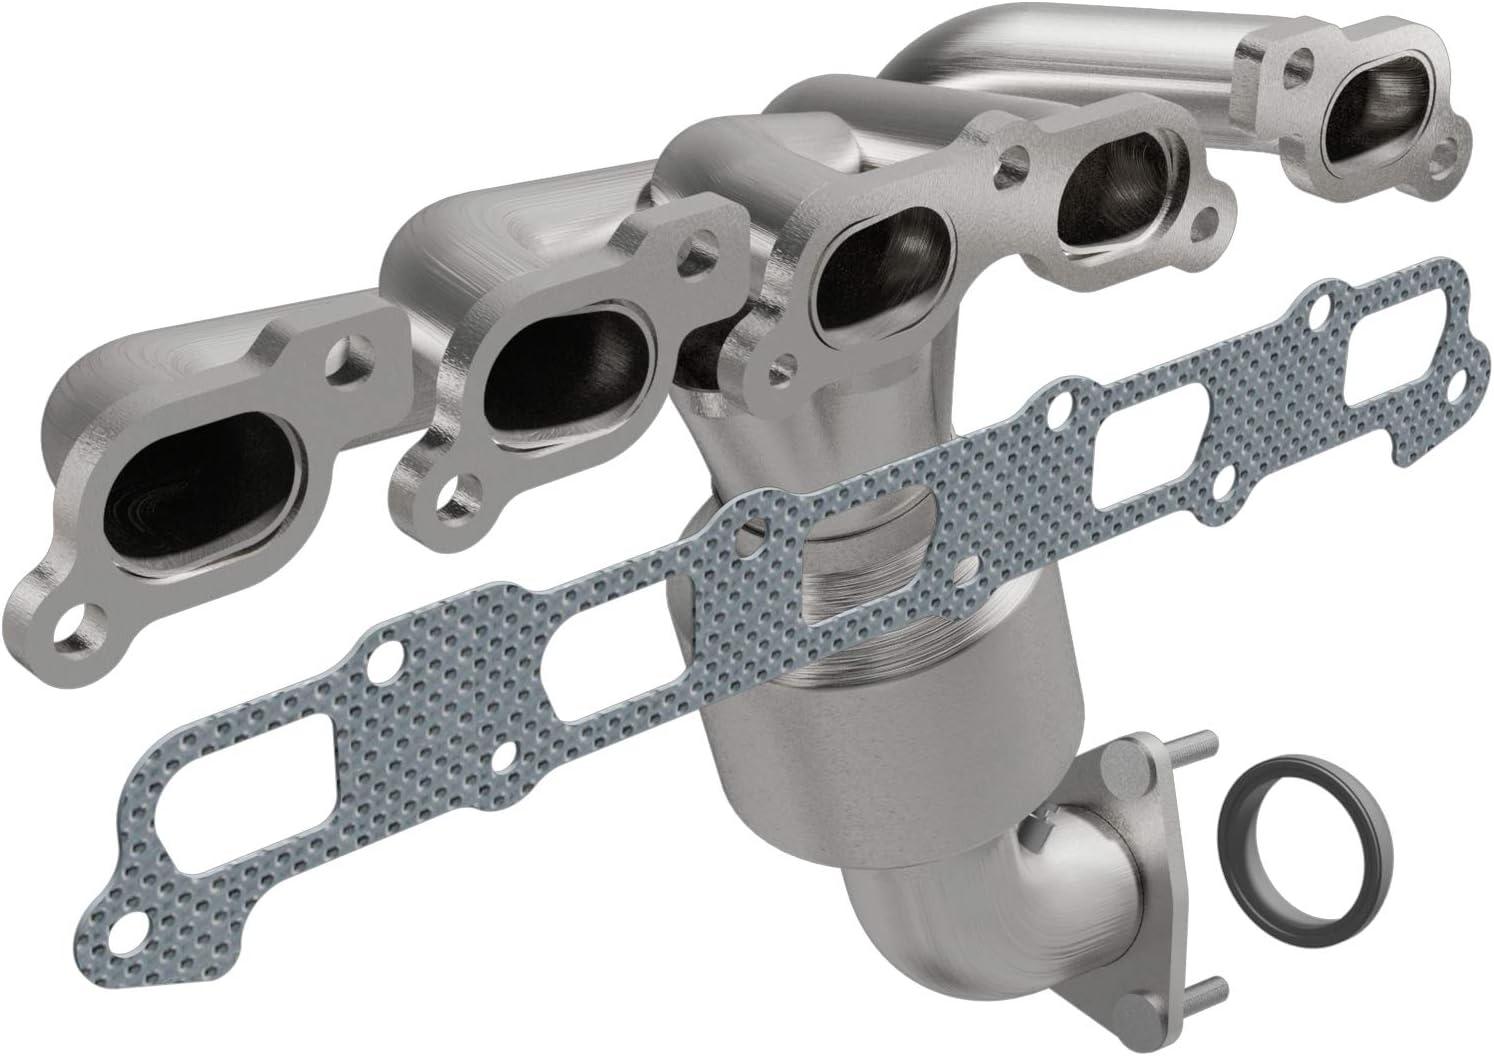 2006 New Dorman 674-703 Catalytic Converter Exhaust Manifold for Hummer H3 3.5